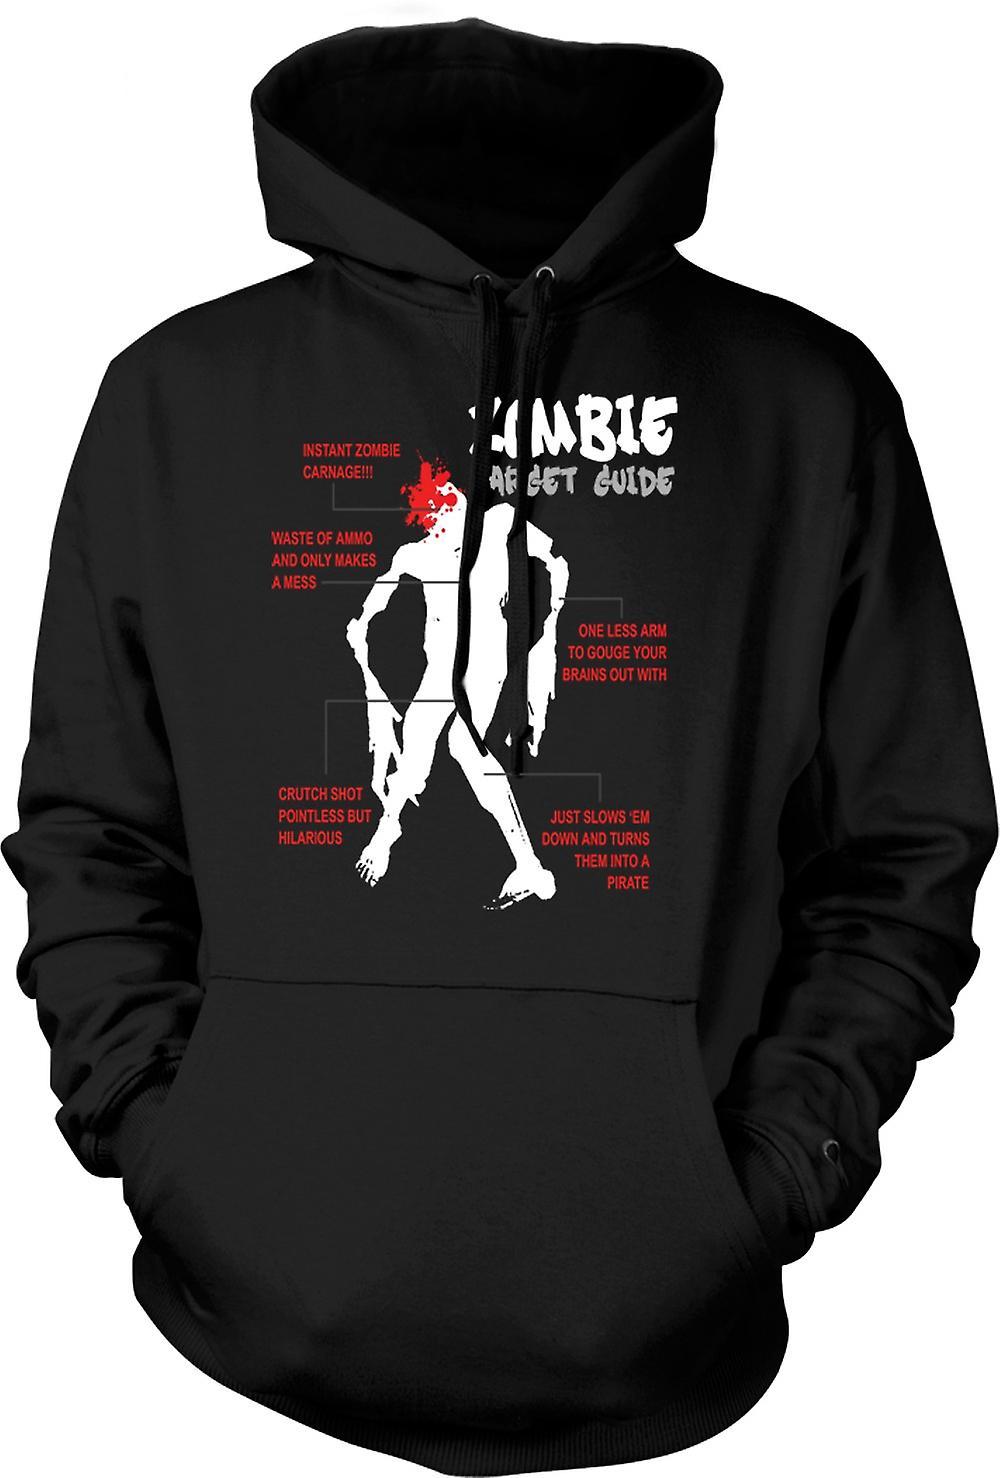 Mens Hoodie - Zombie Target gids - grappige